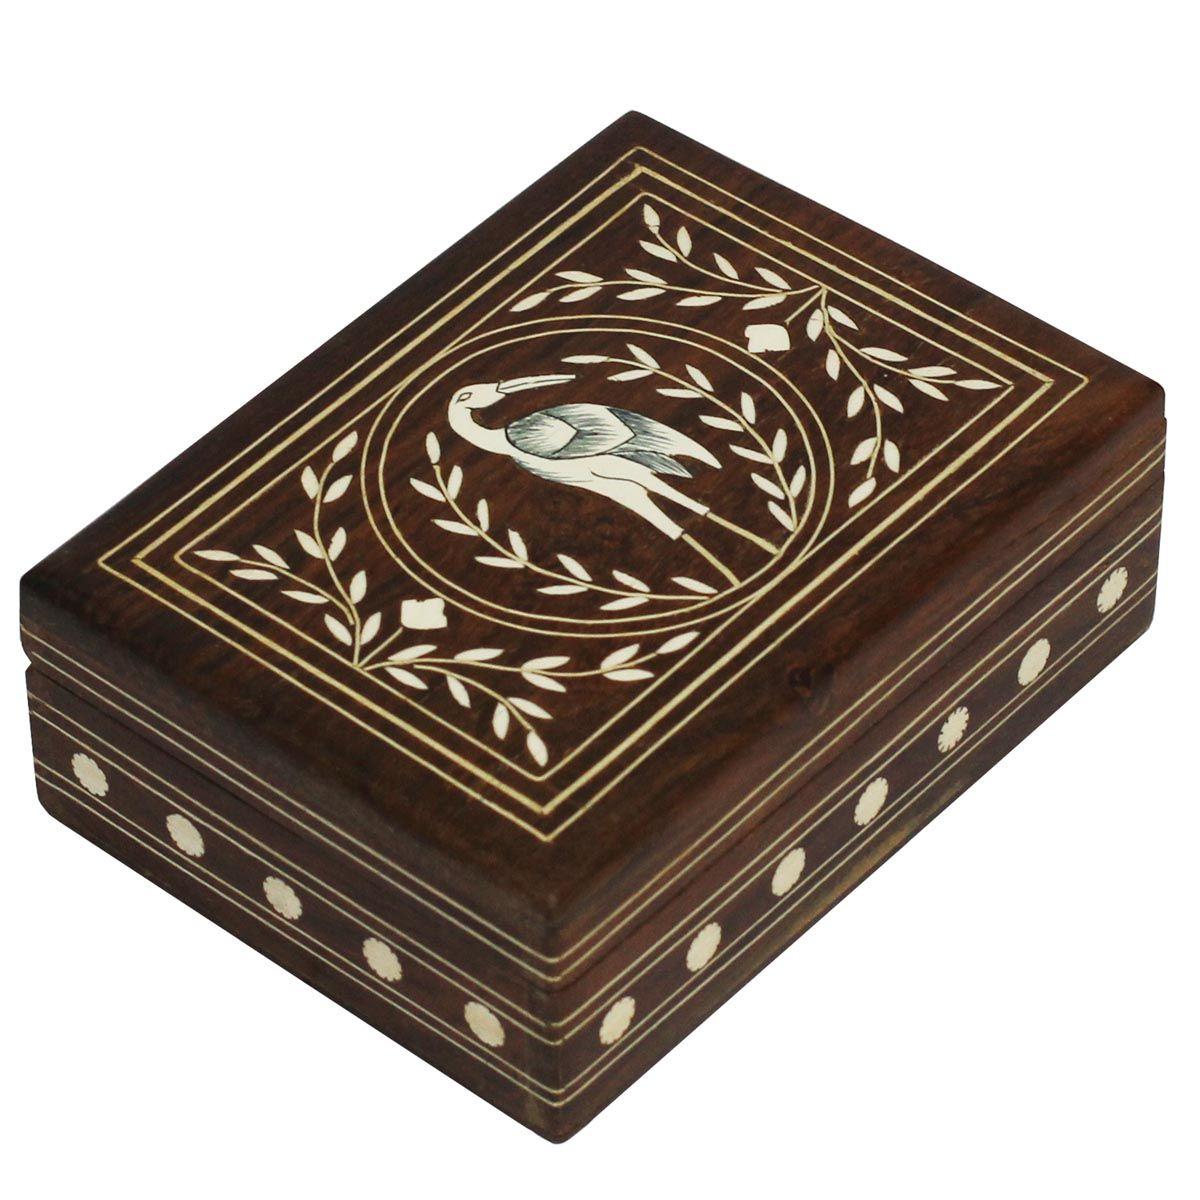 "Bulk Wholesale 7"" Rectangular Shaped Wooden Jewelry Box"